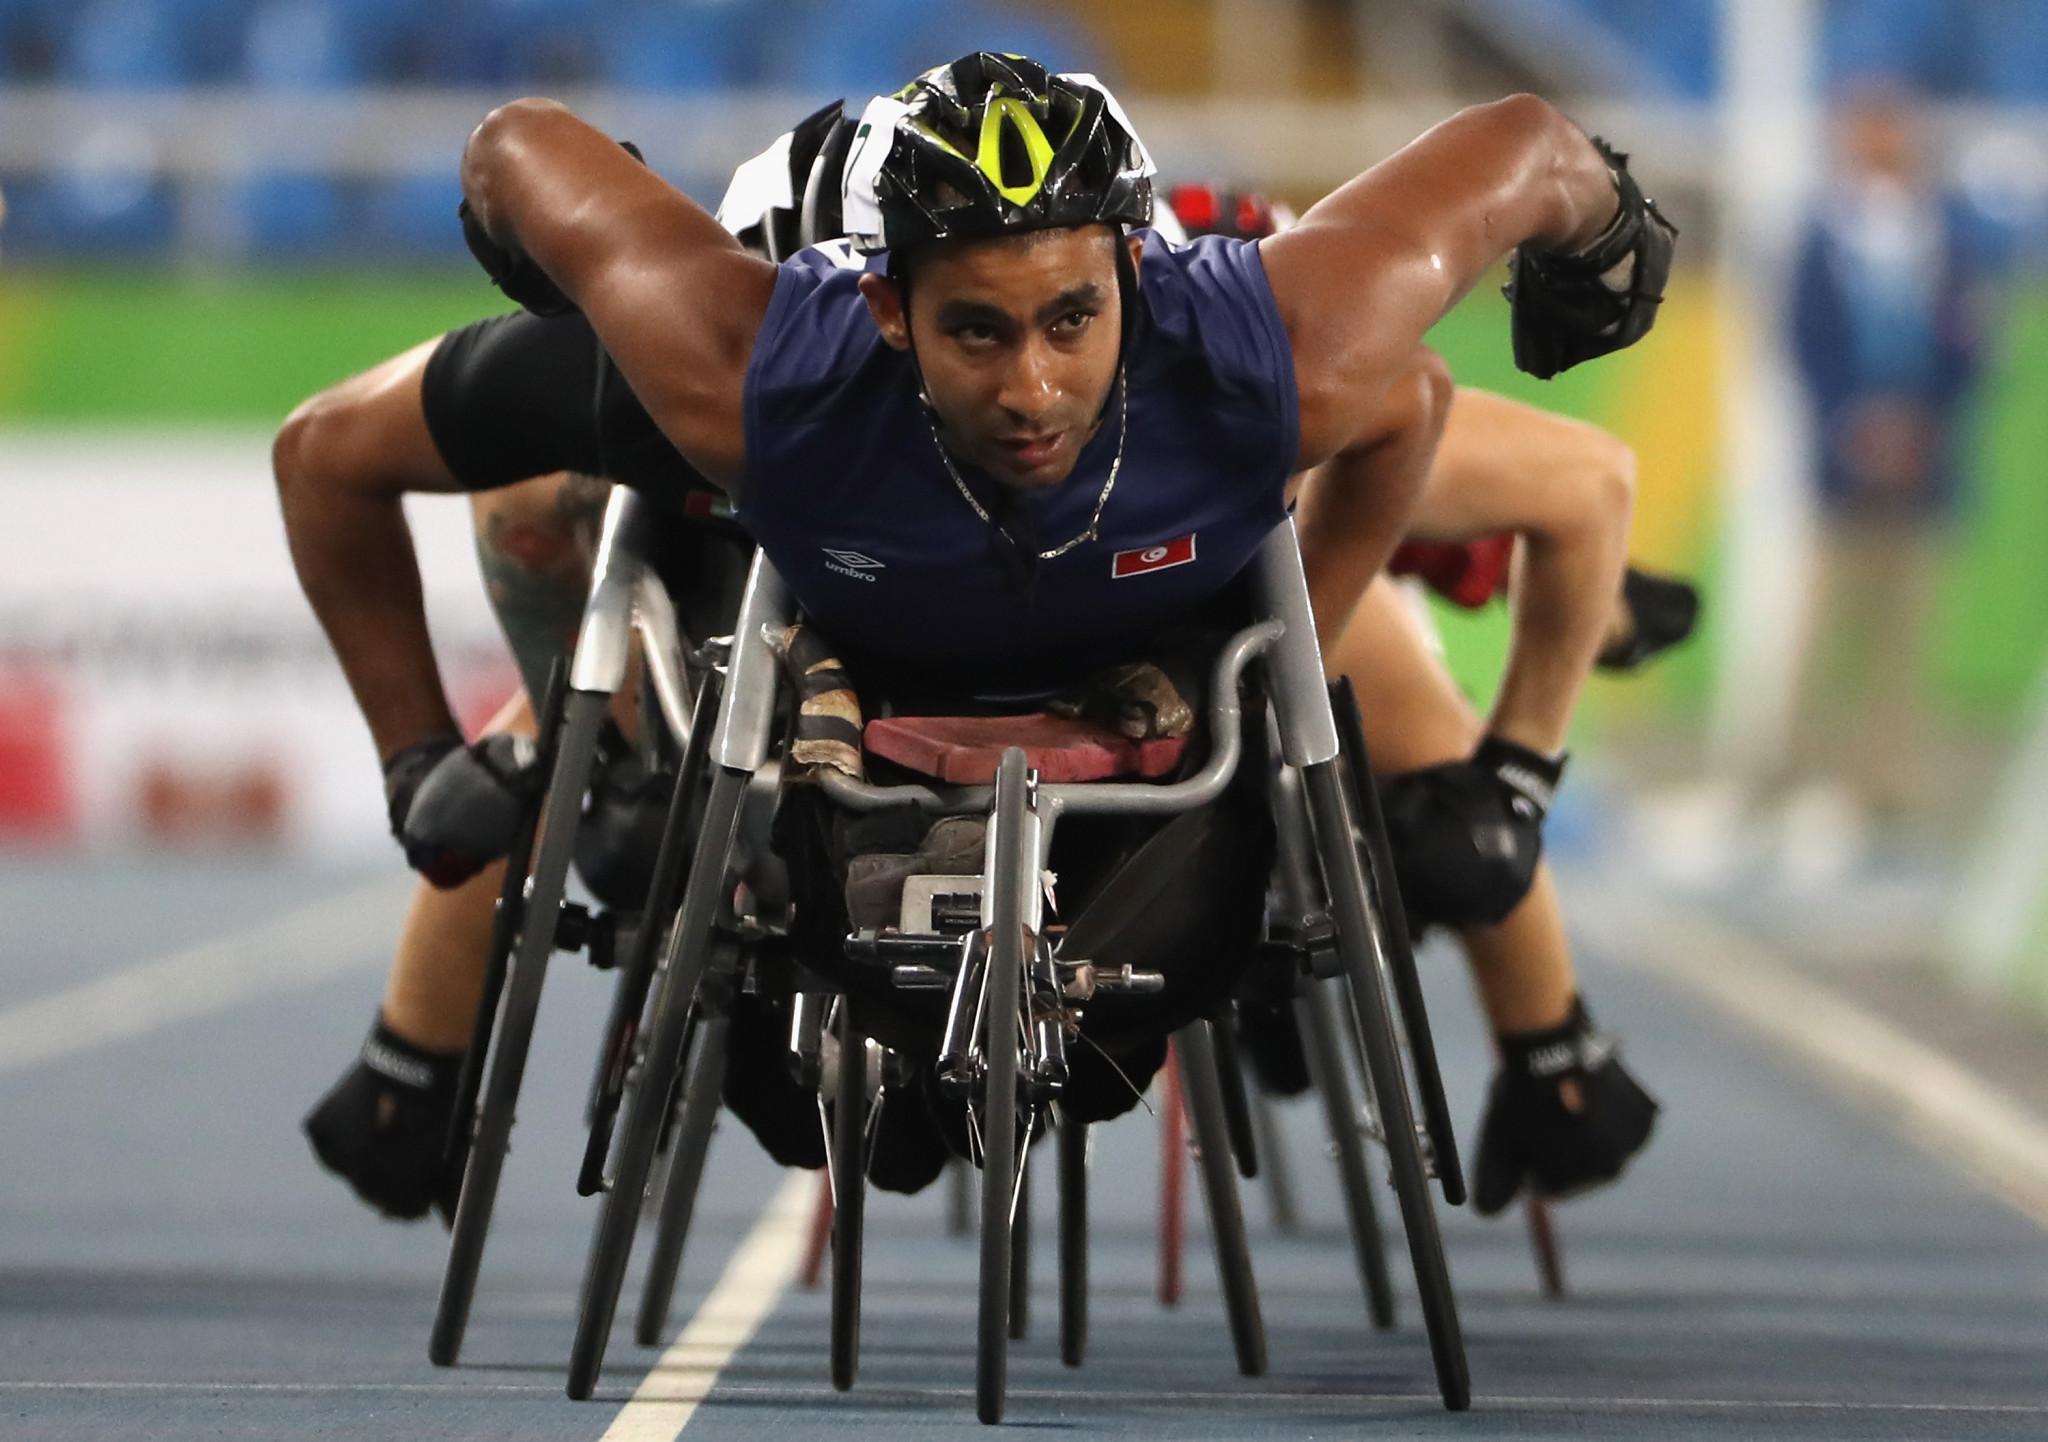 Ktila secures third gold of World Para Athletics Grand Prix in Dubai